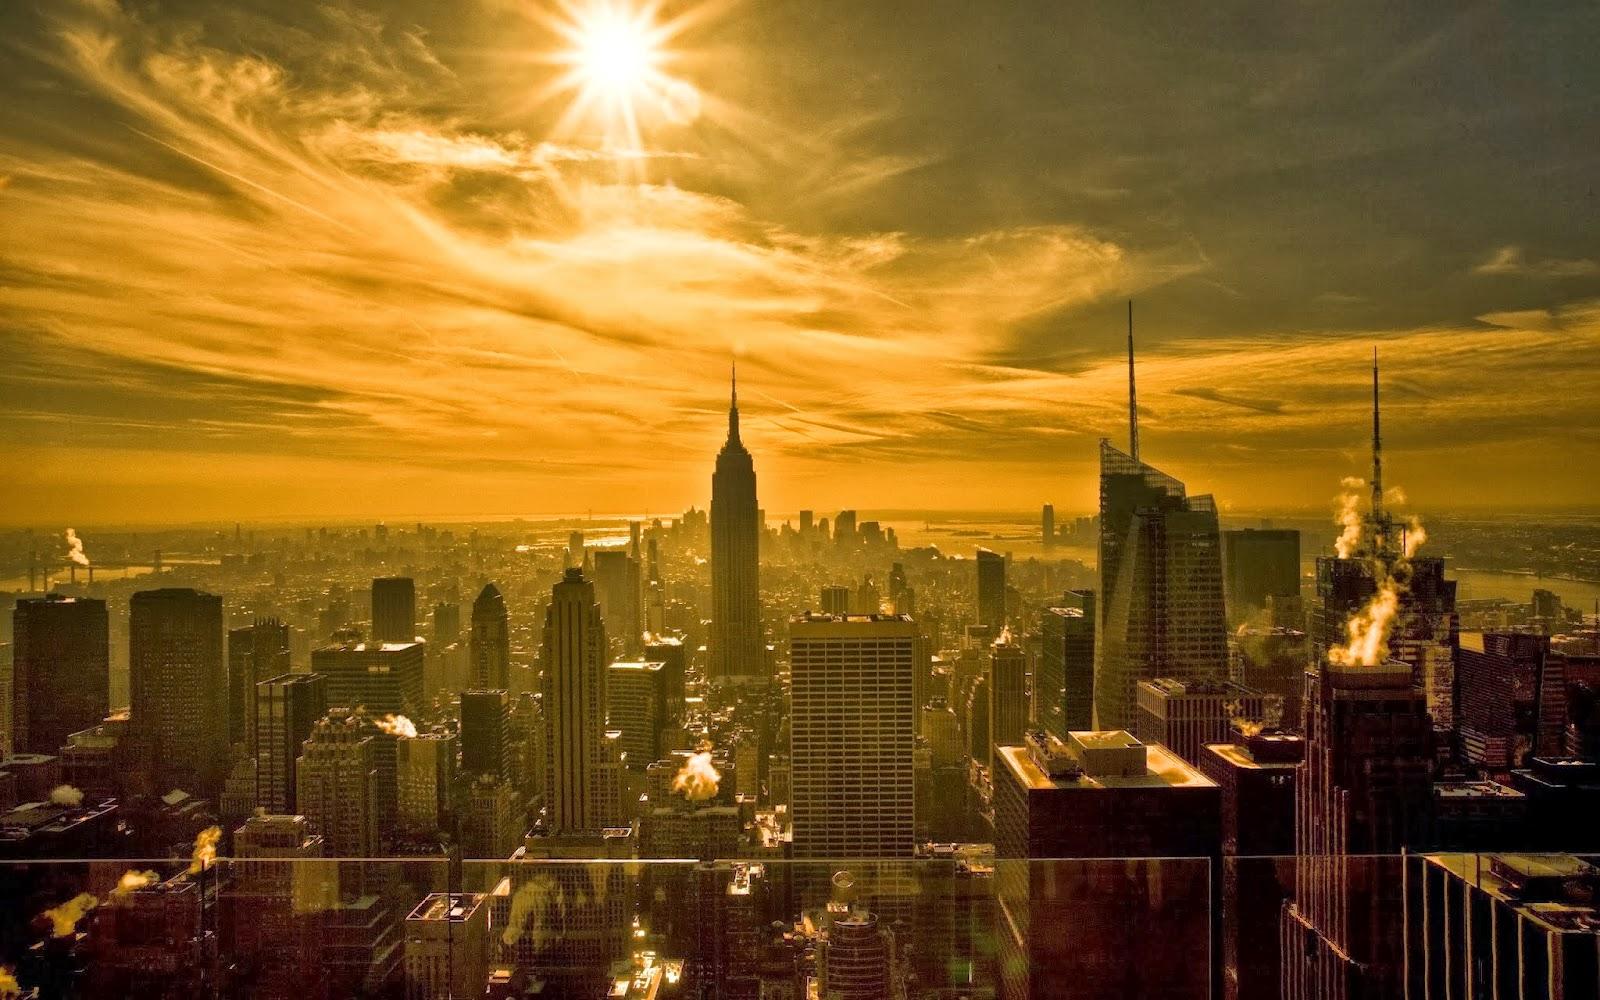 Dreama The Beauty Of New York